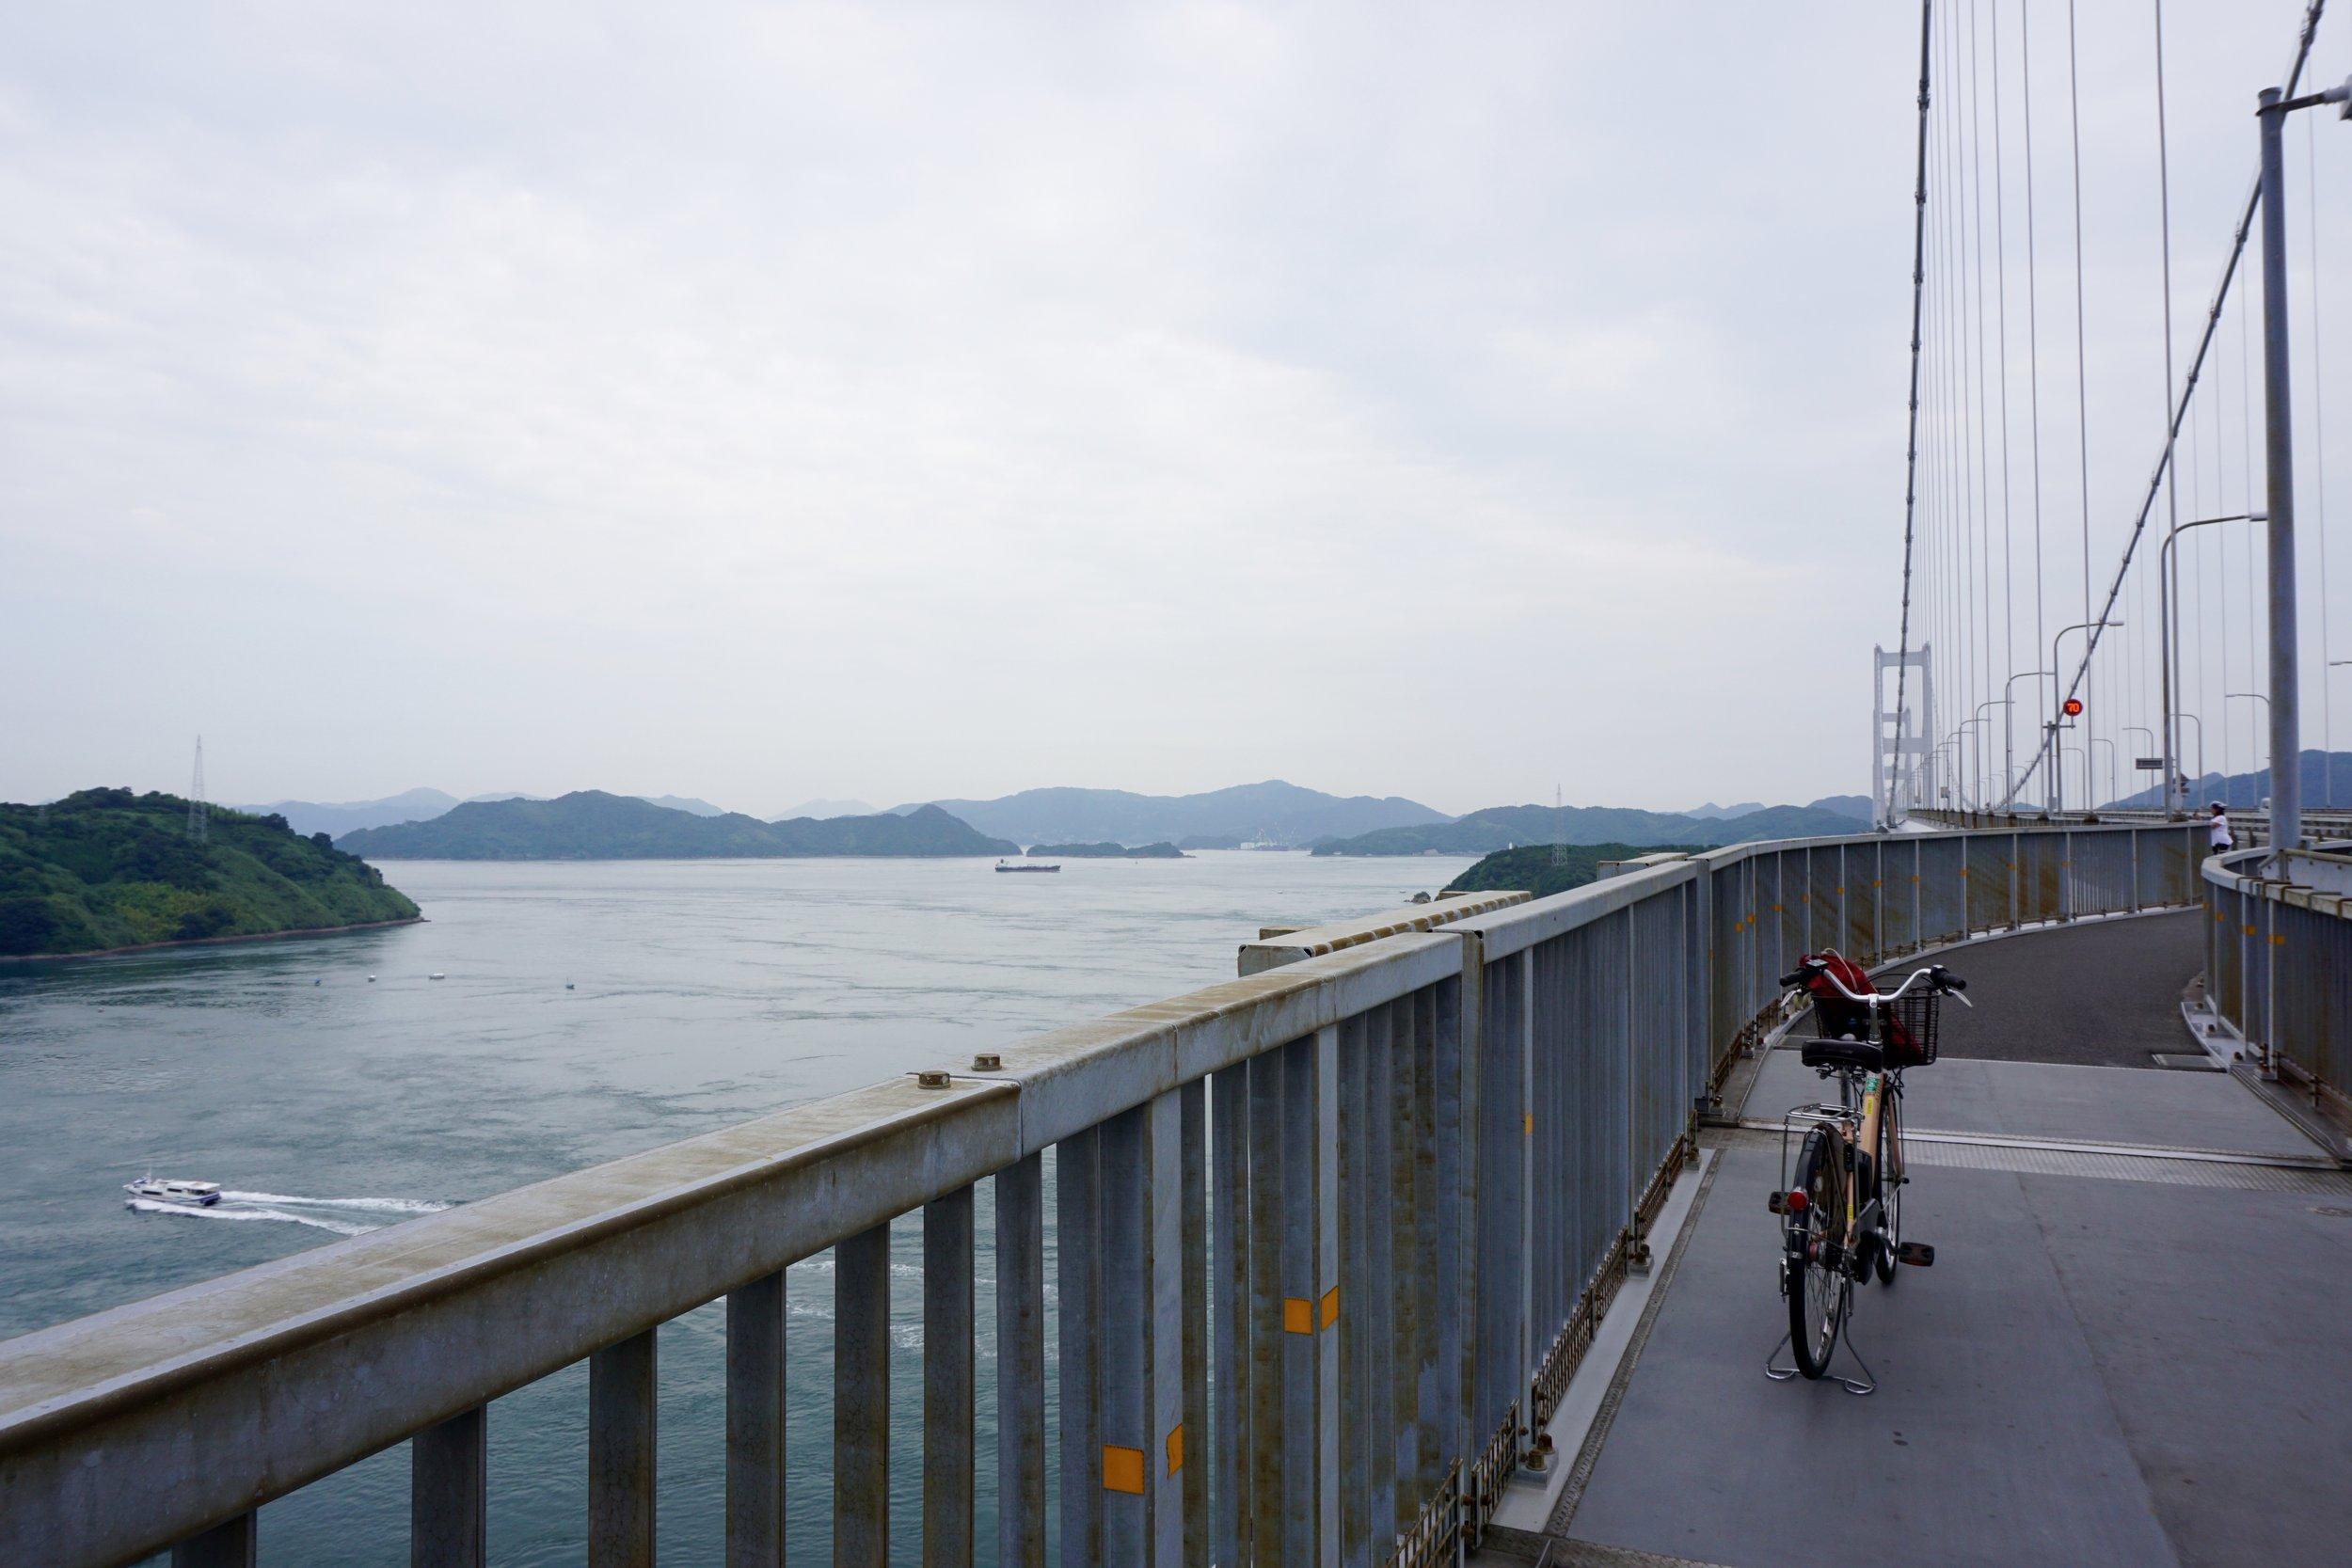 Shimanami Kaido Waterways